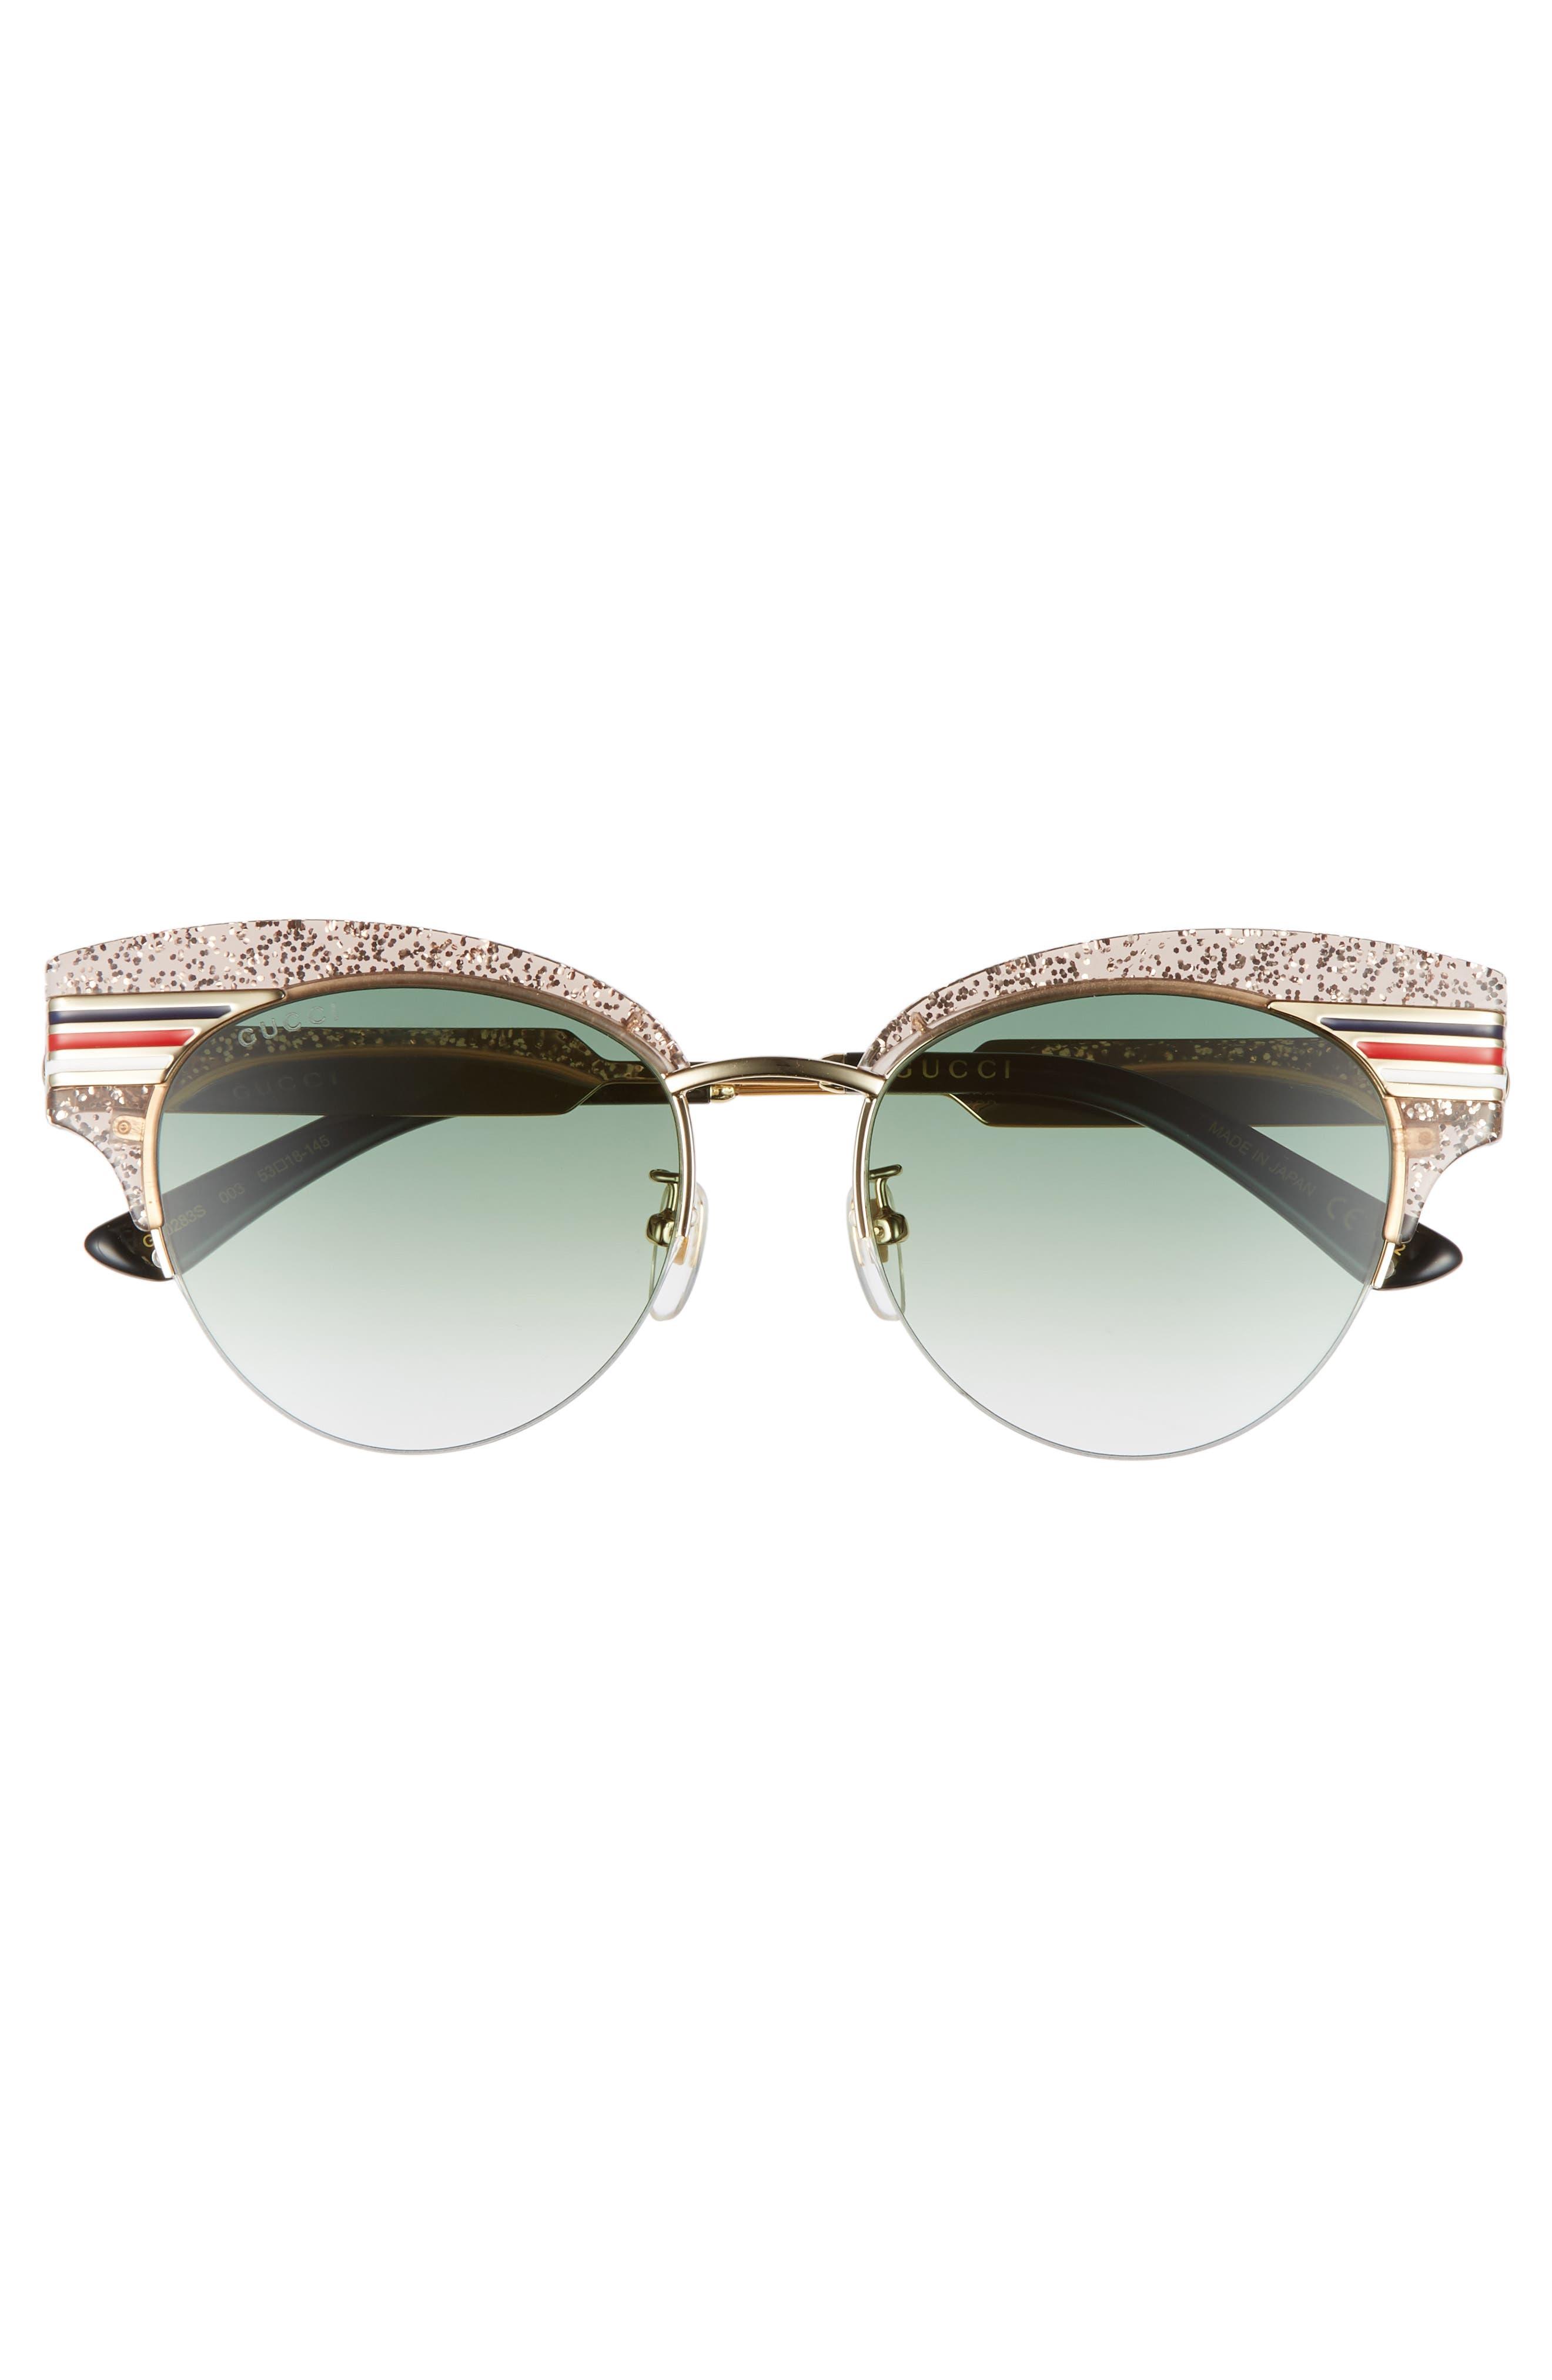 53mm Cat Eye Sunglasses,                             Alternate thumbnail 3, color,                             NUDE/ GOLD/ BLACK